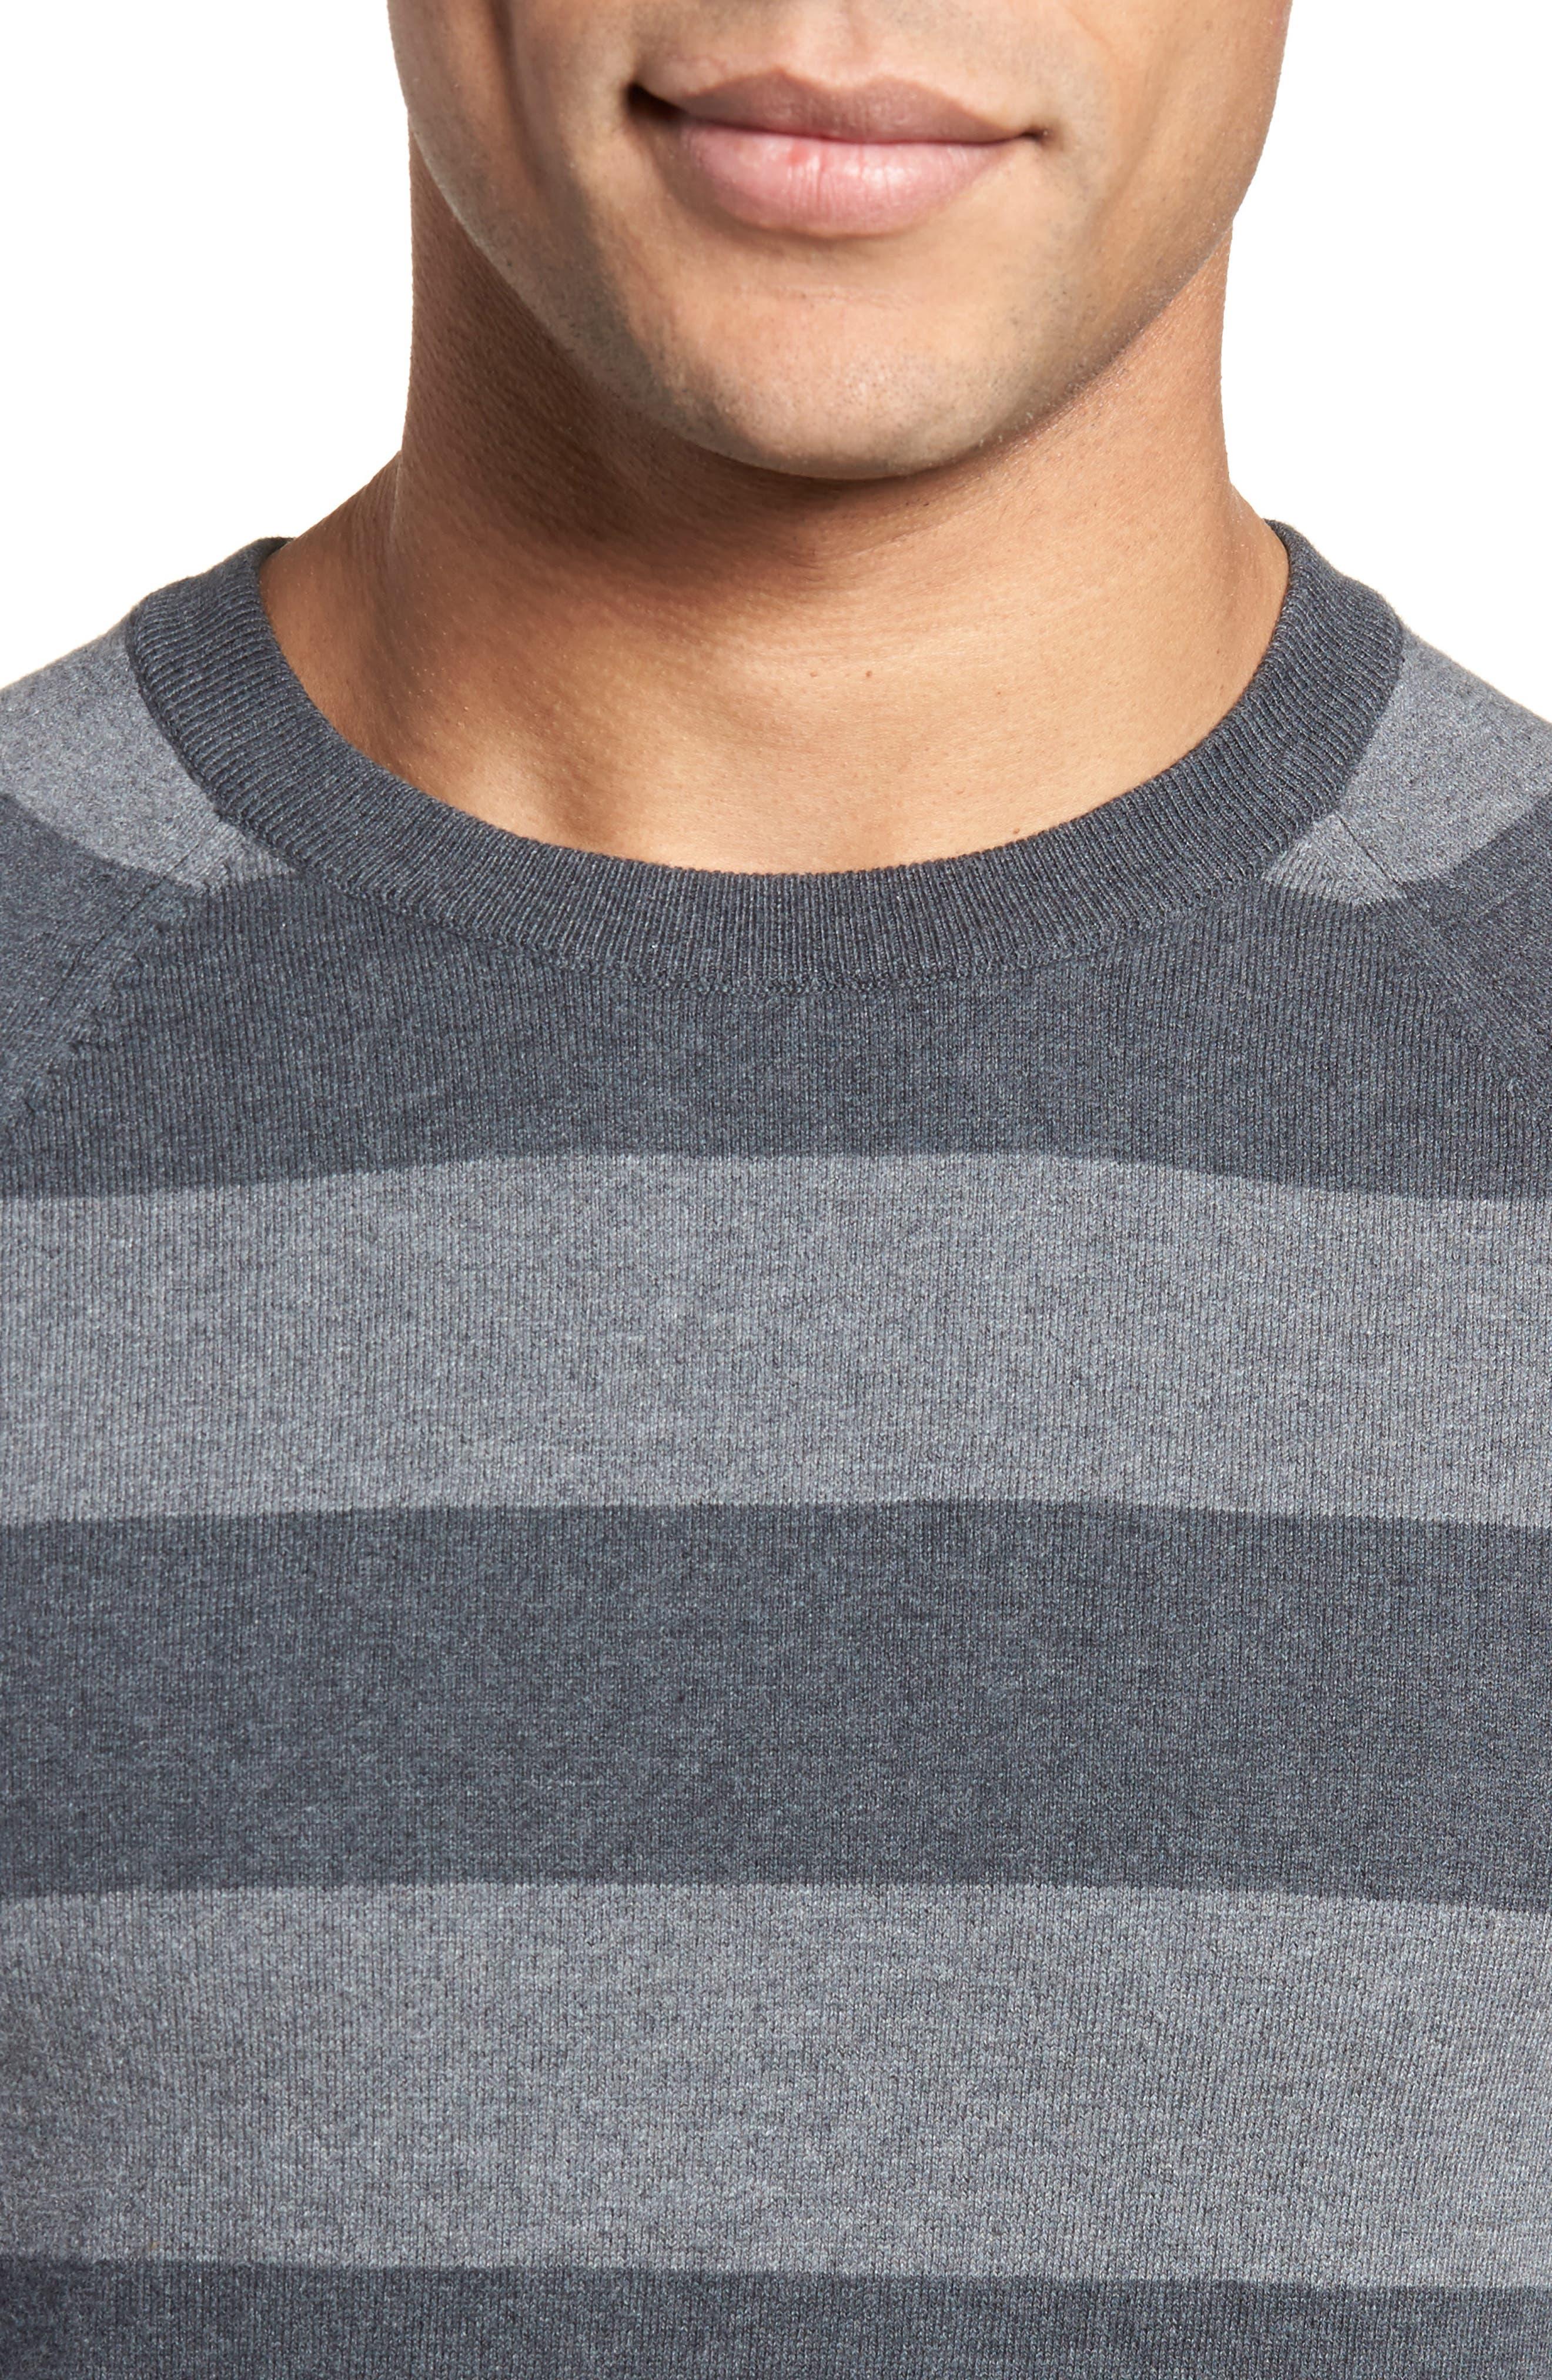 Stripe Stretch Cotton Sweater,                             Alternate thumbnail 4, color,                             Mid Grey/ Charcoal Melange